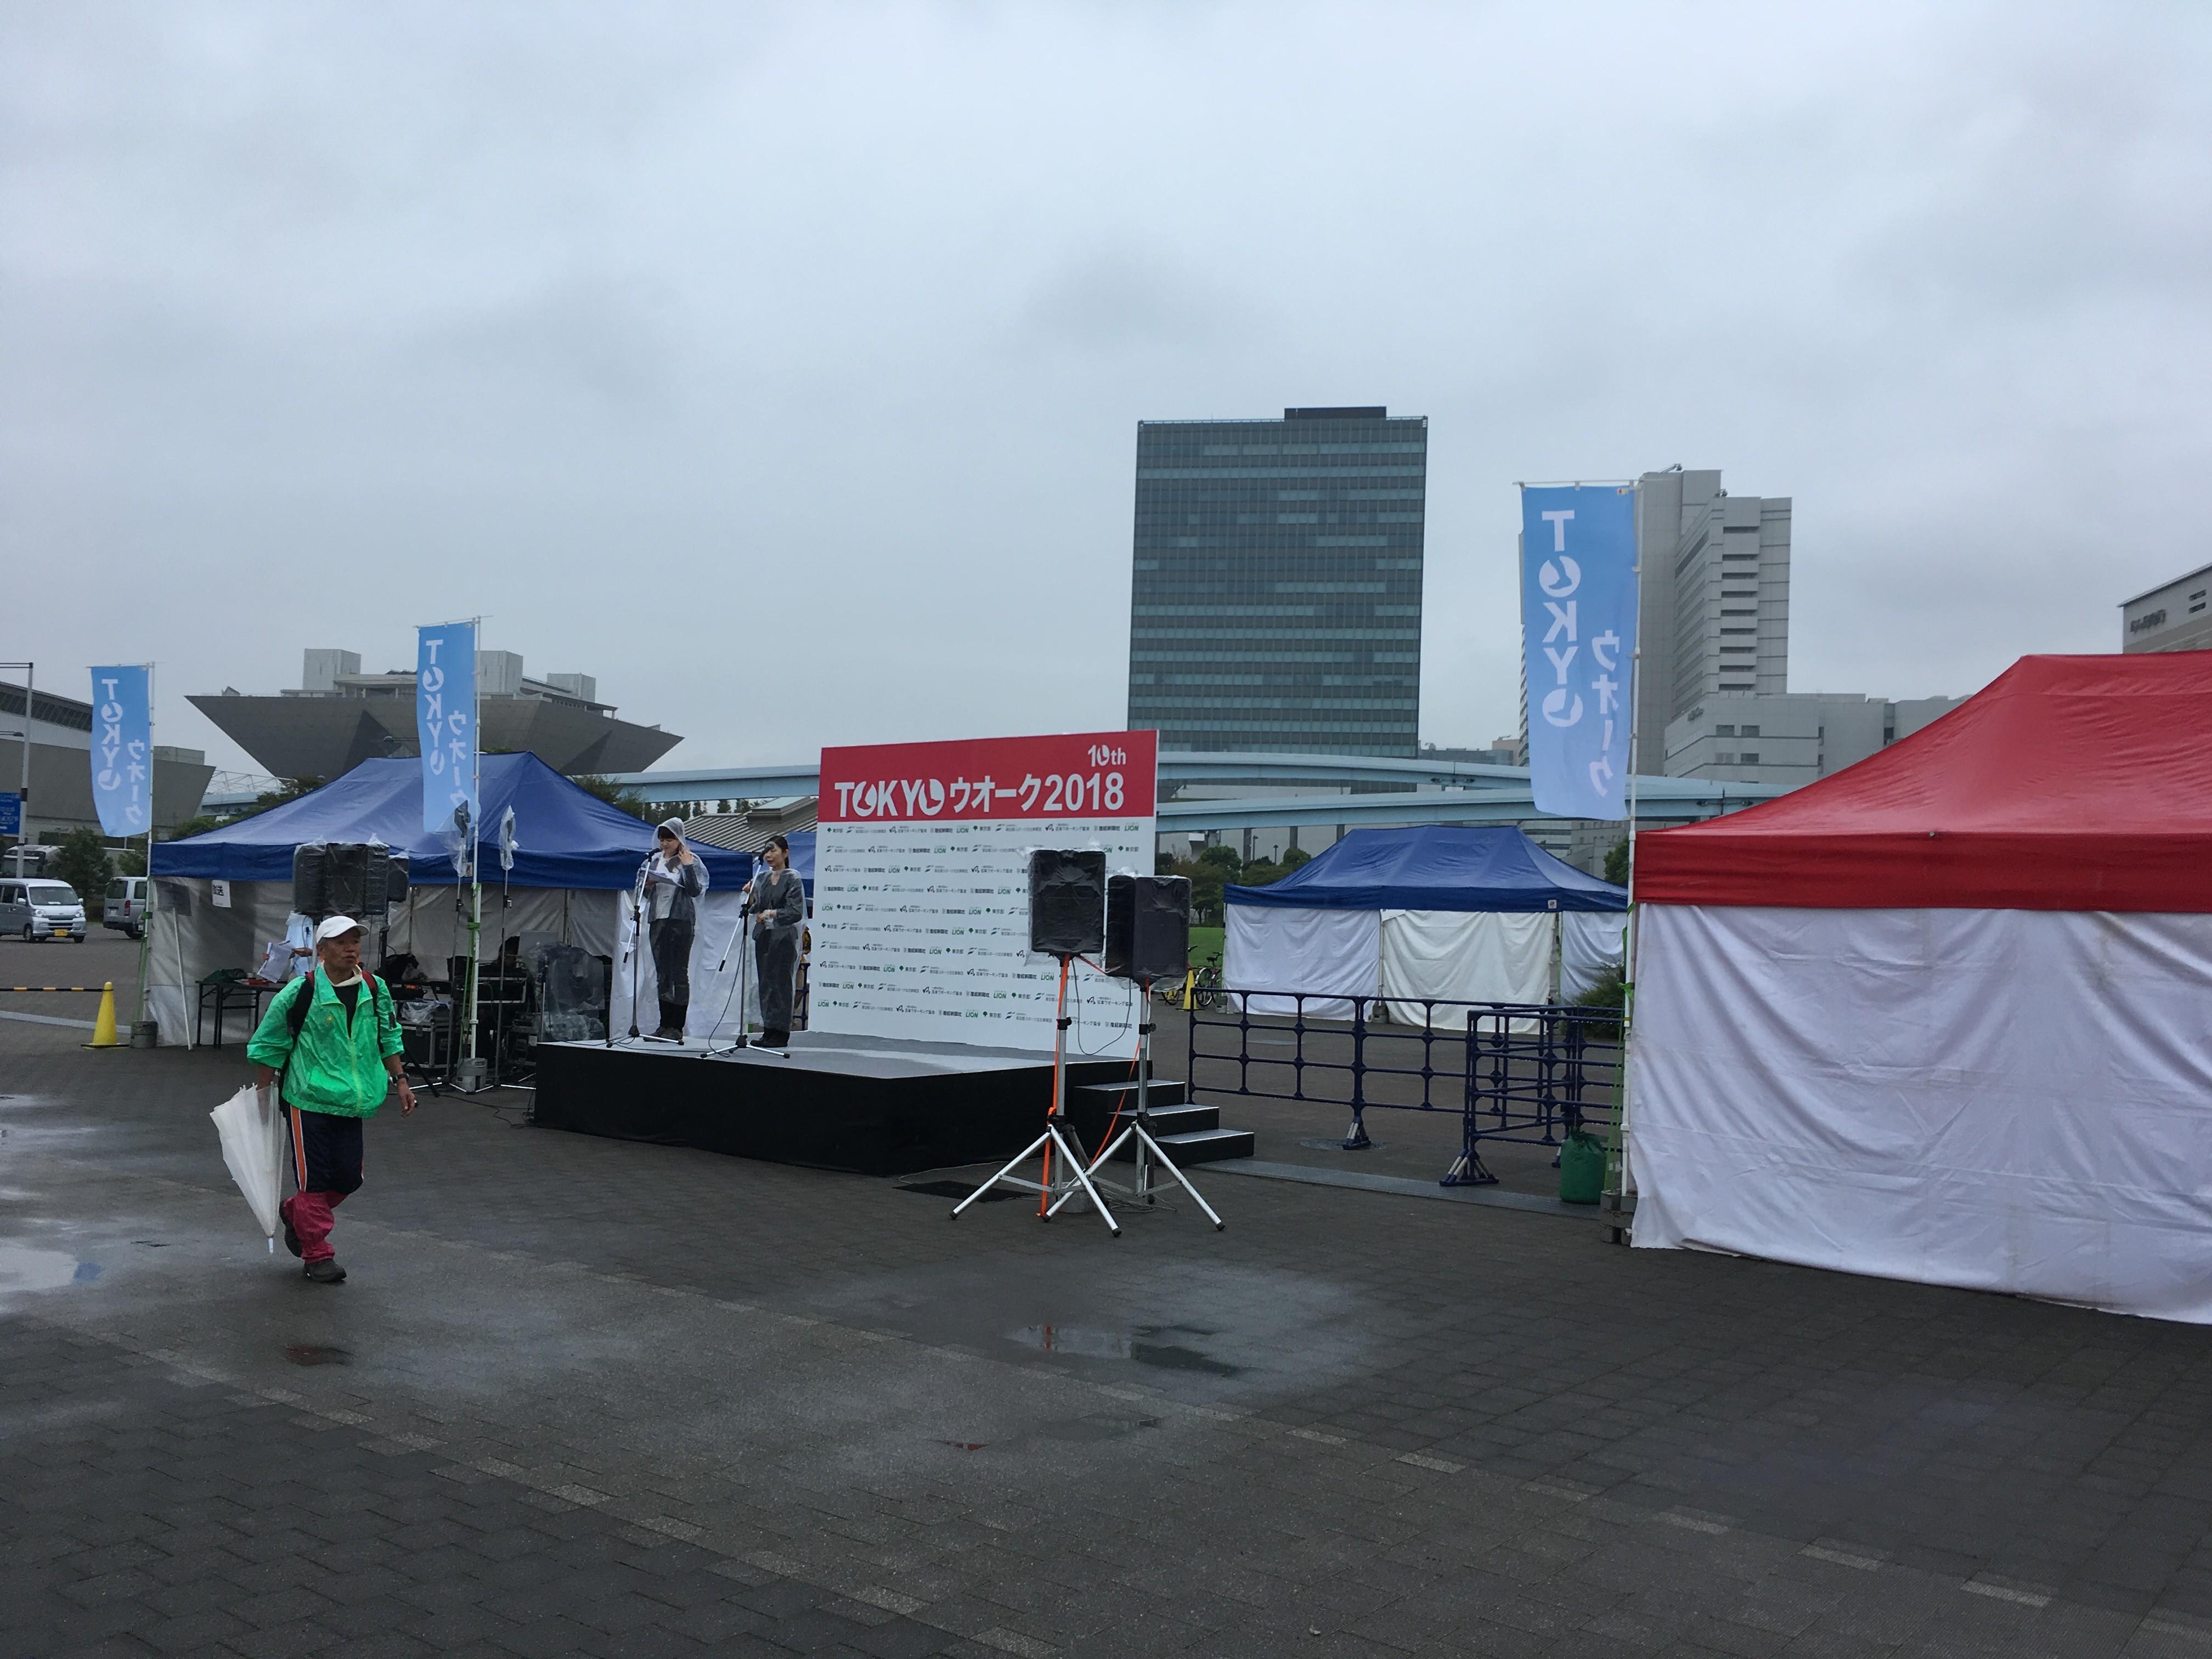 東京臨海広域防災公園(スタート)